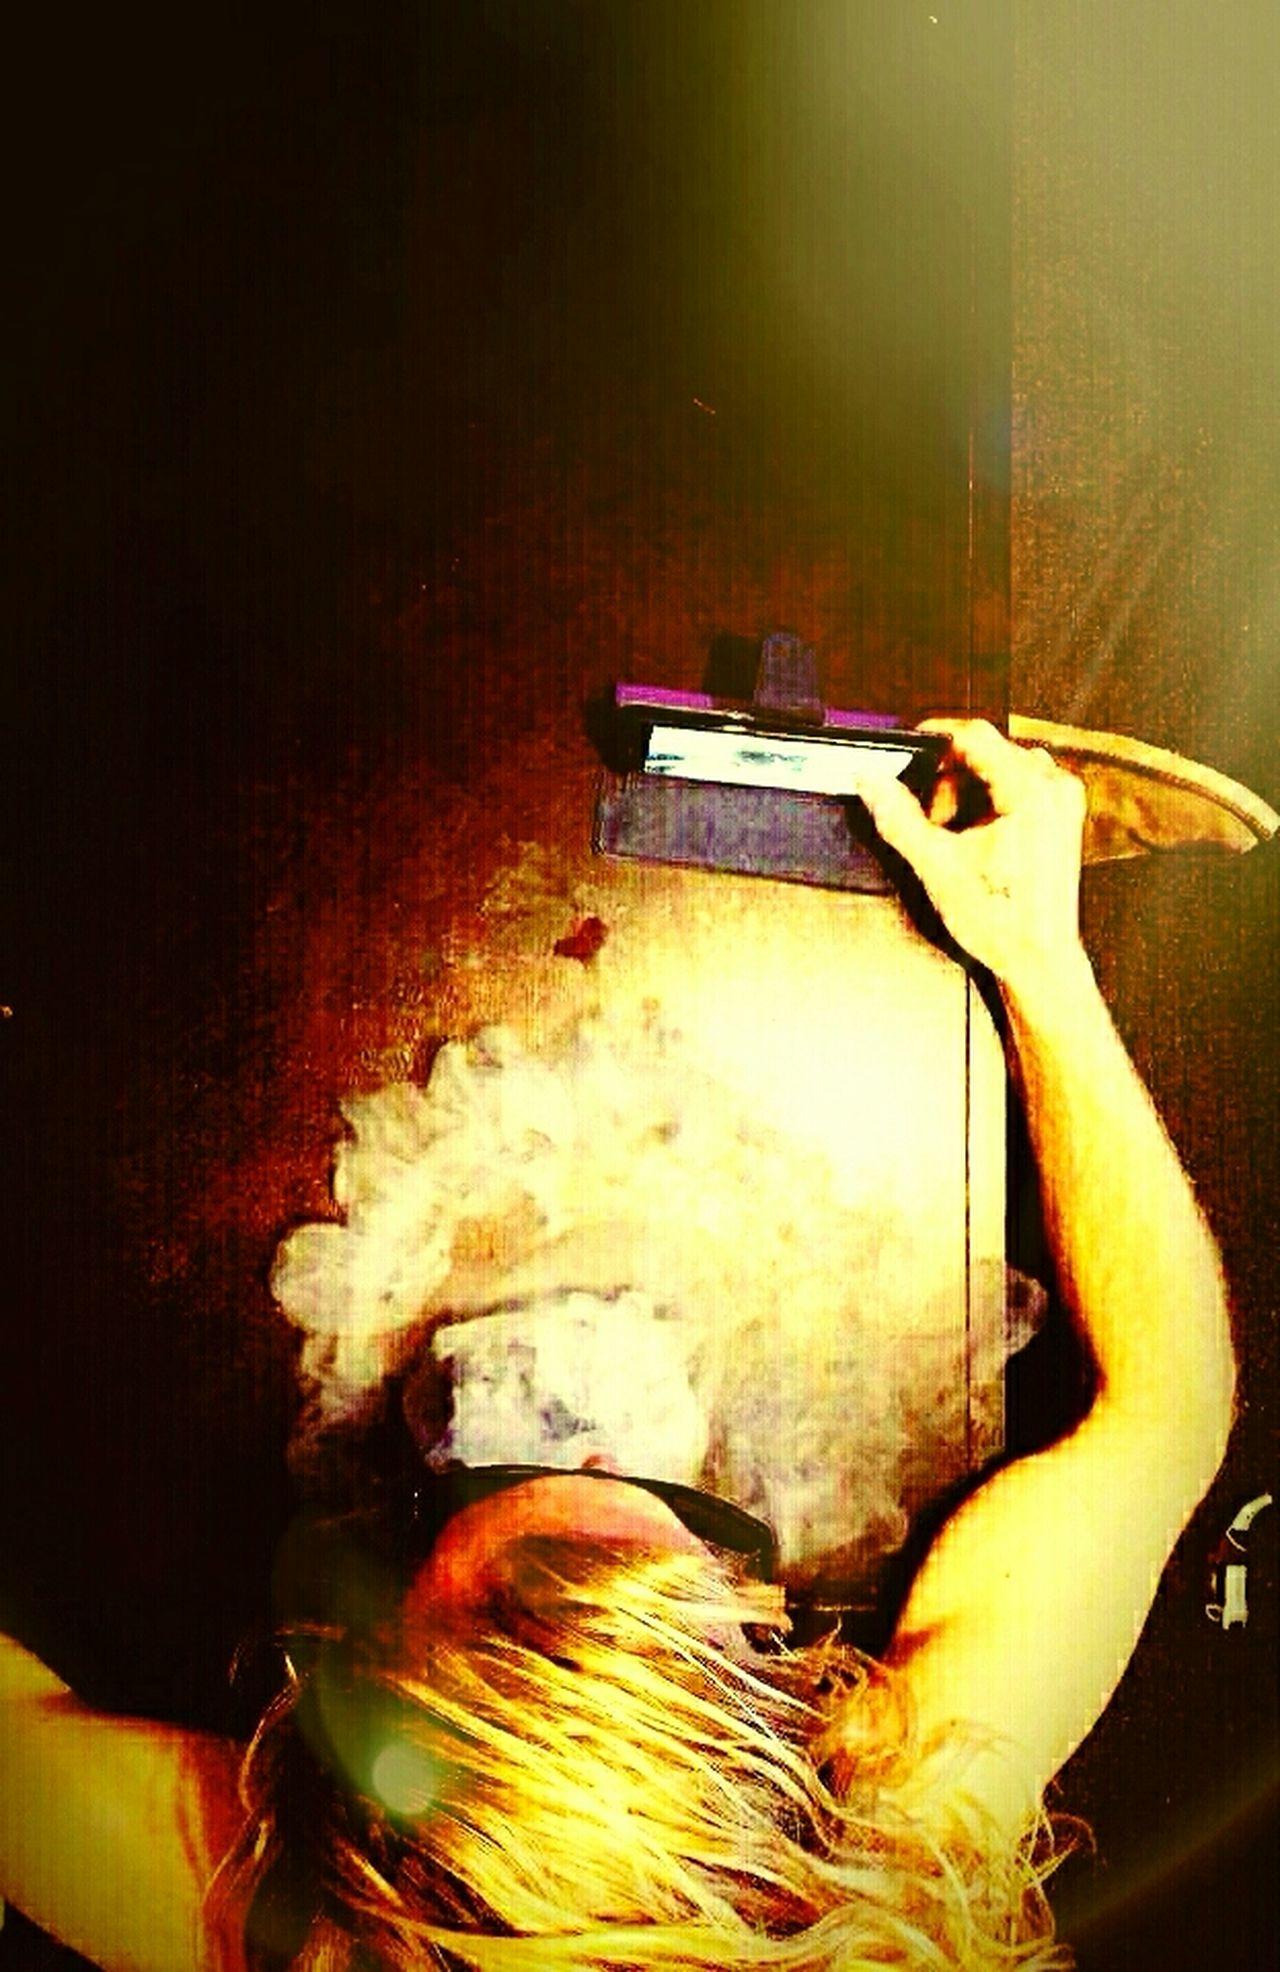 Letmetakeaselfie Self Portrait Smoke Photo Of The Day Taking Photos Smoking Cloudporn Photography Enjoying Life Androidography Faces Of EyeEm FacesOfEyeEm Drugs Photoart Photooftheday Cheese! Birds Eye View CreativePhotographer Professionalphotography